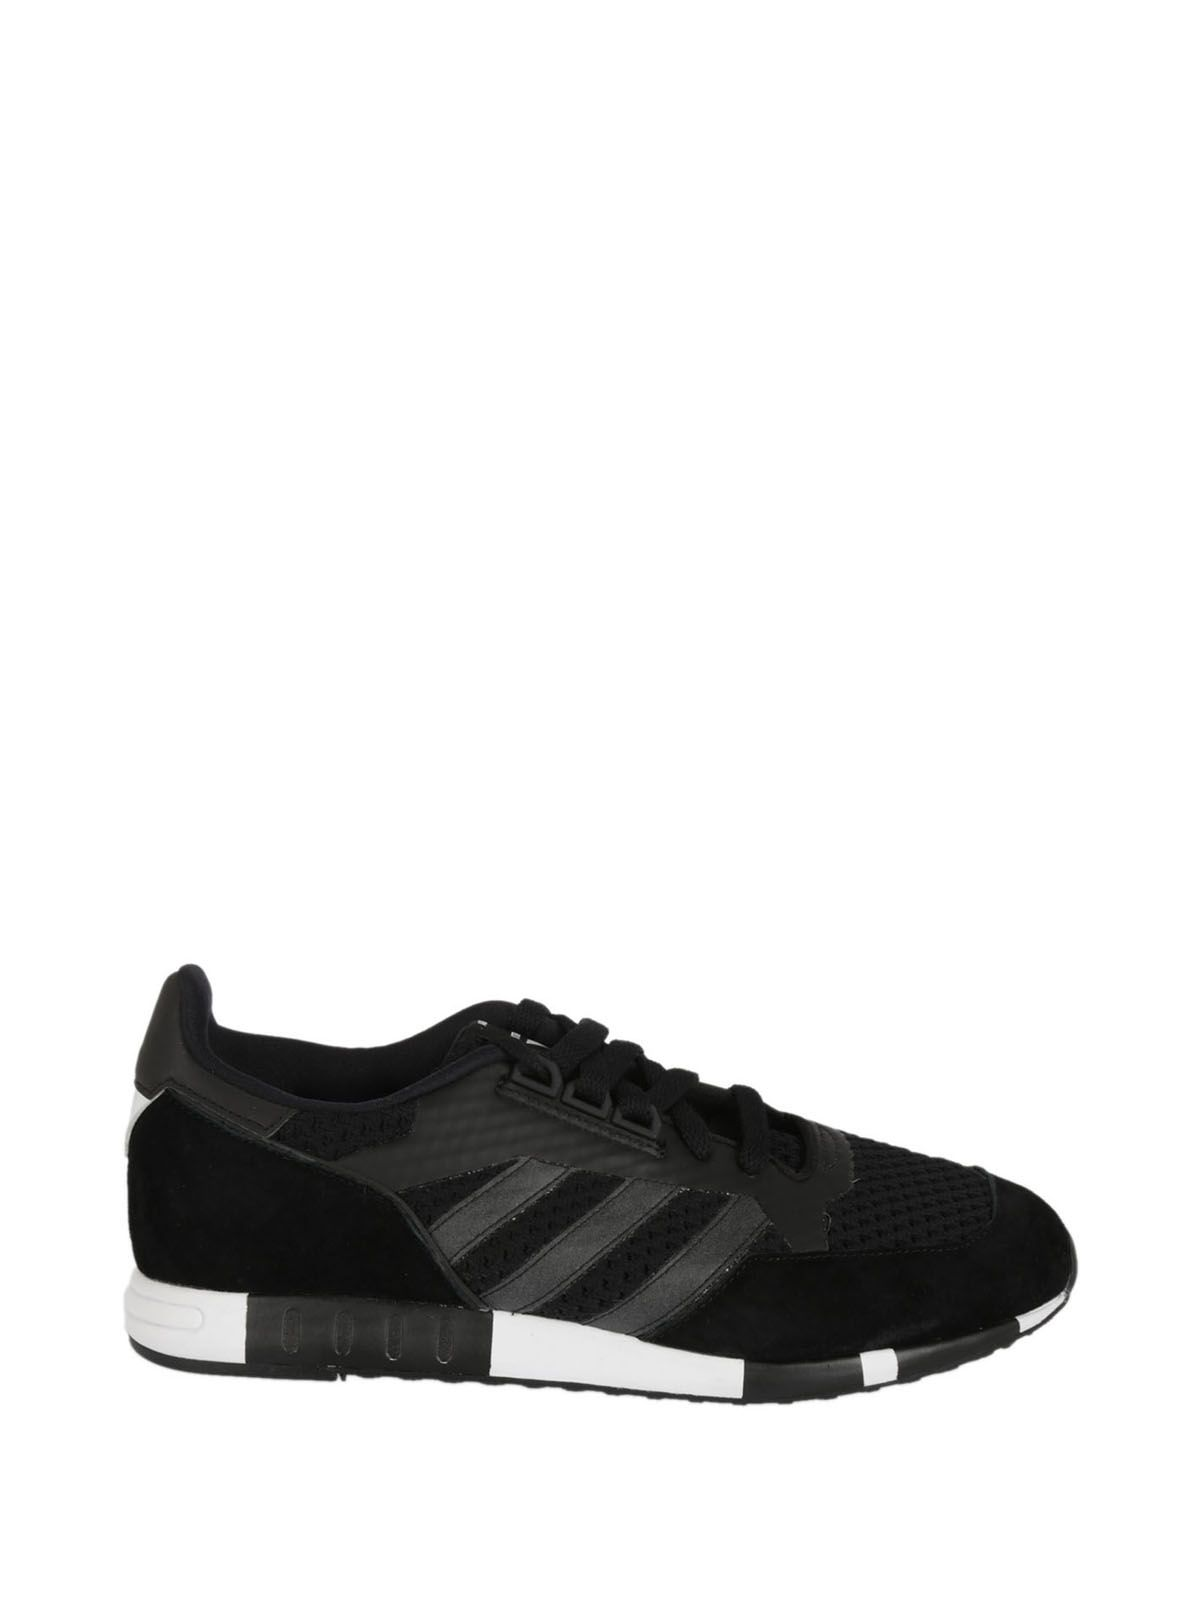 Adidas Originals X White Mountaineering Boston Super Primeknit Sneakers